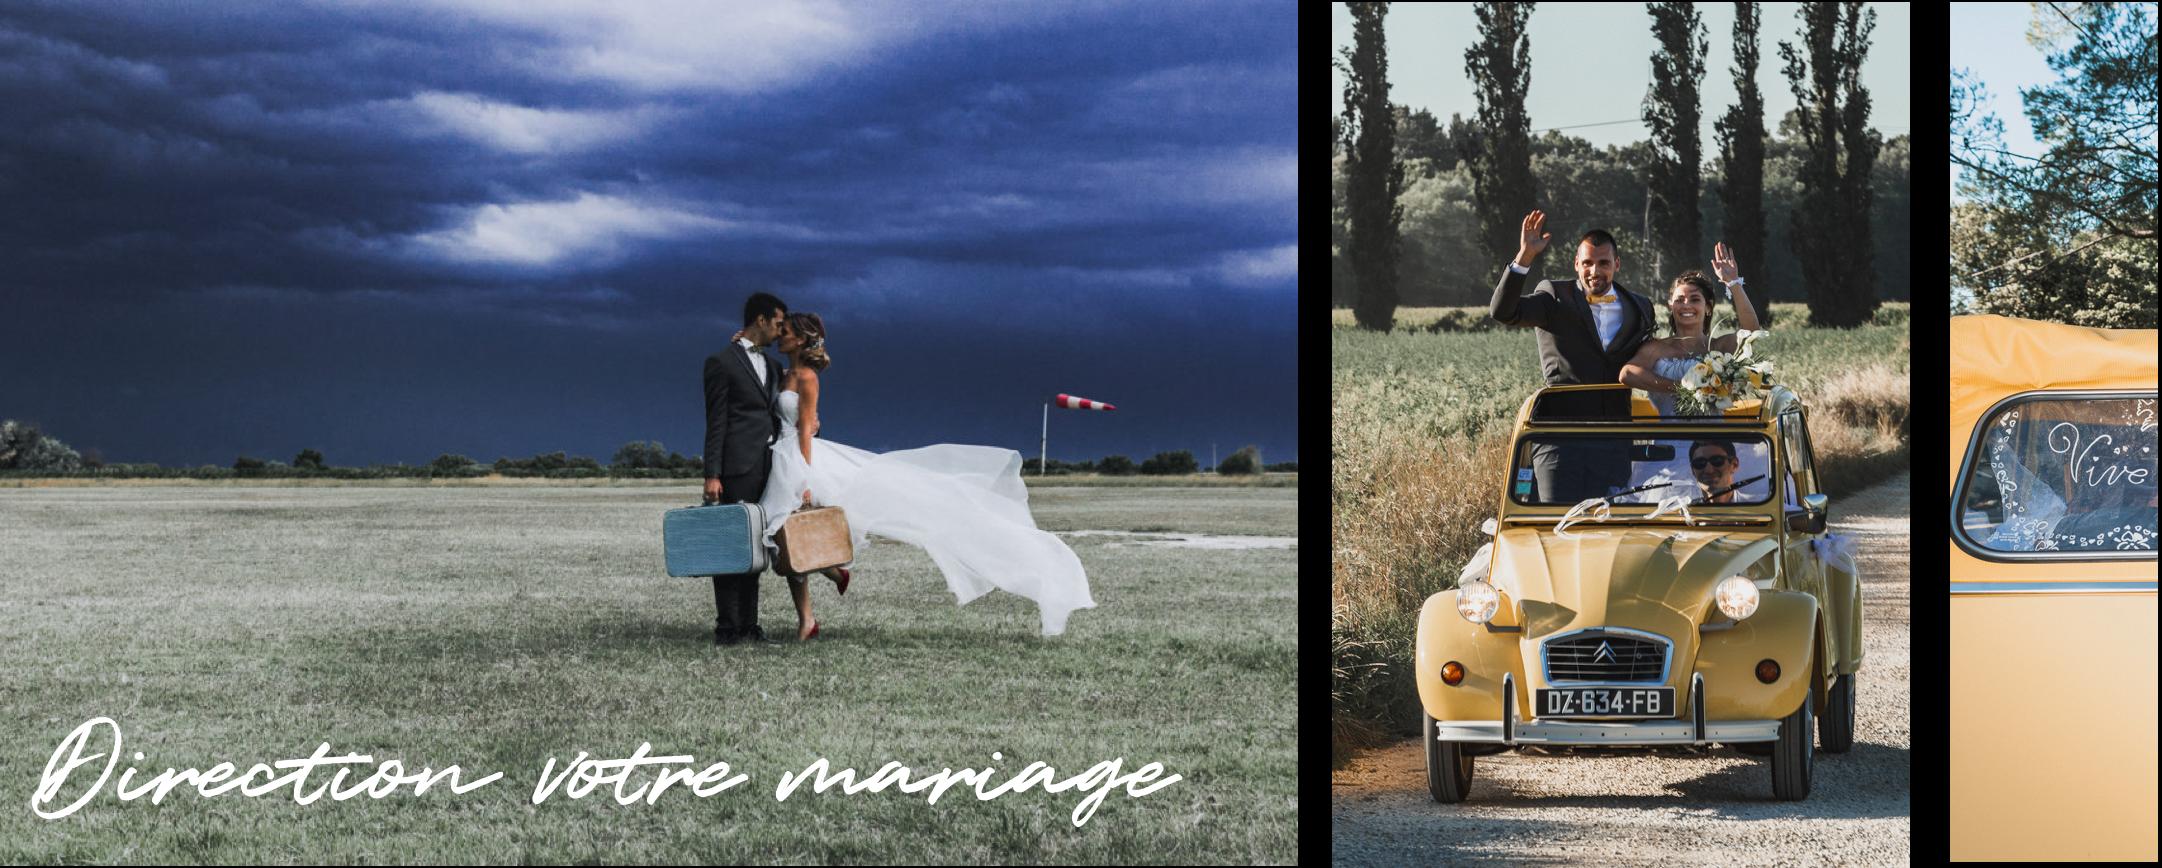 Alan laureau Photographe de mariage en Provence